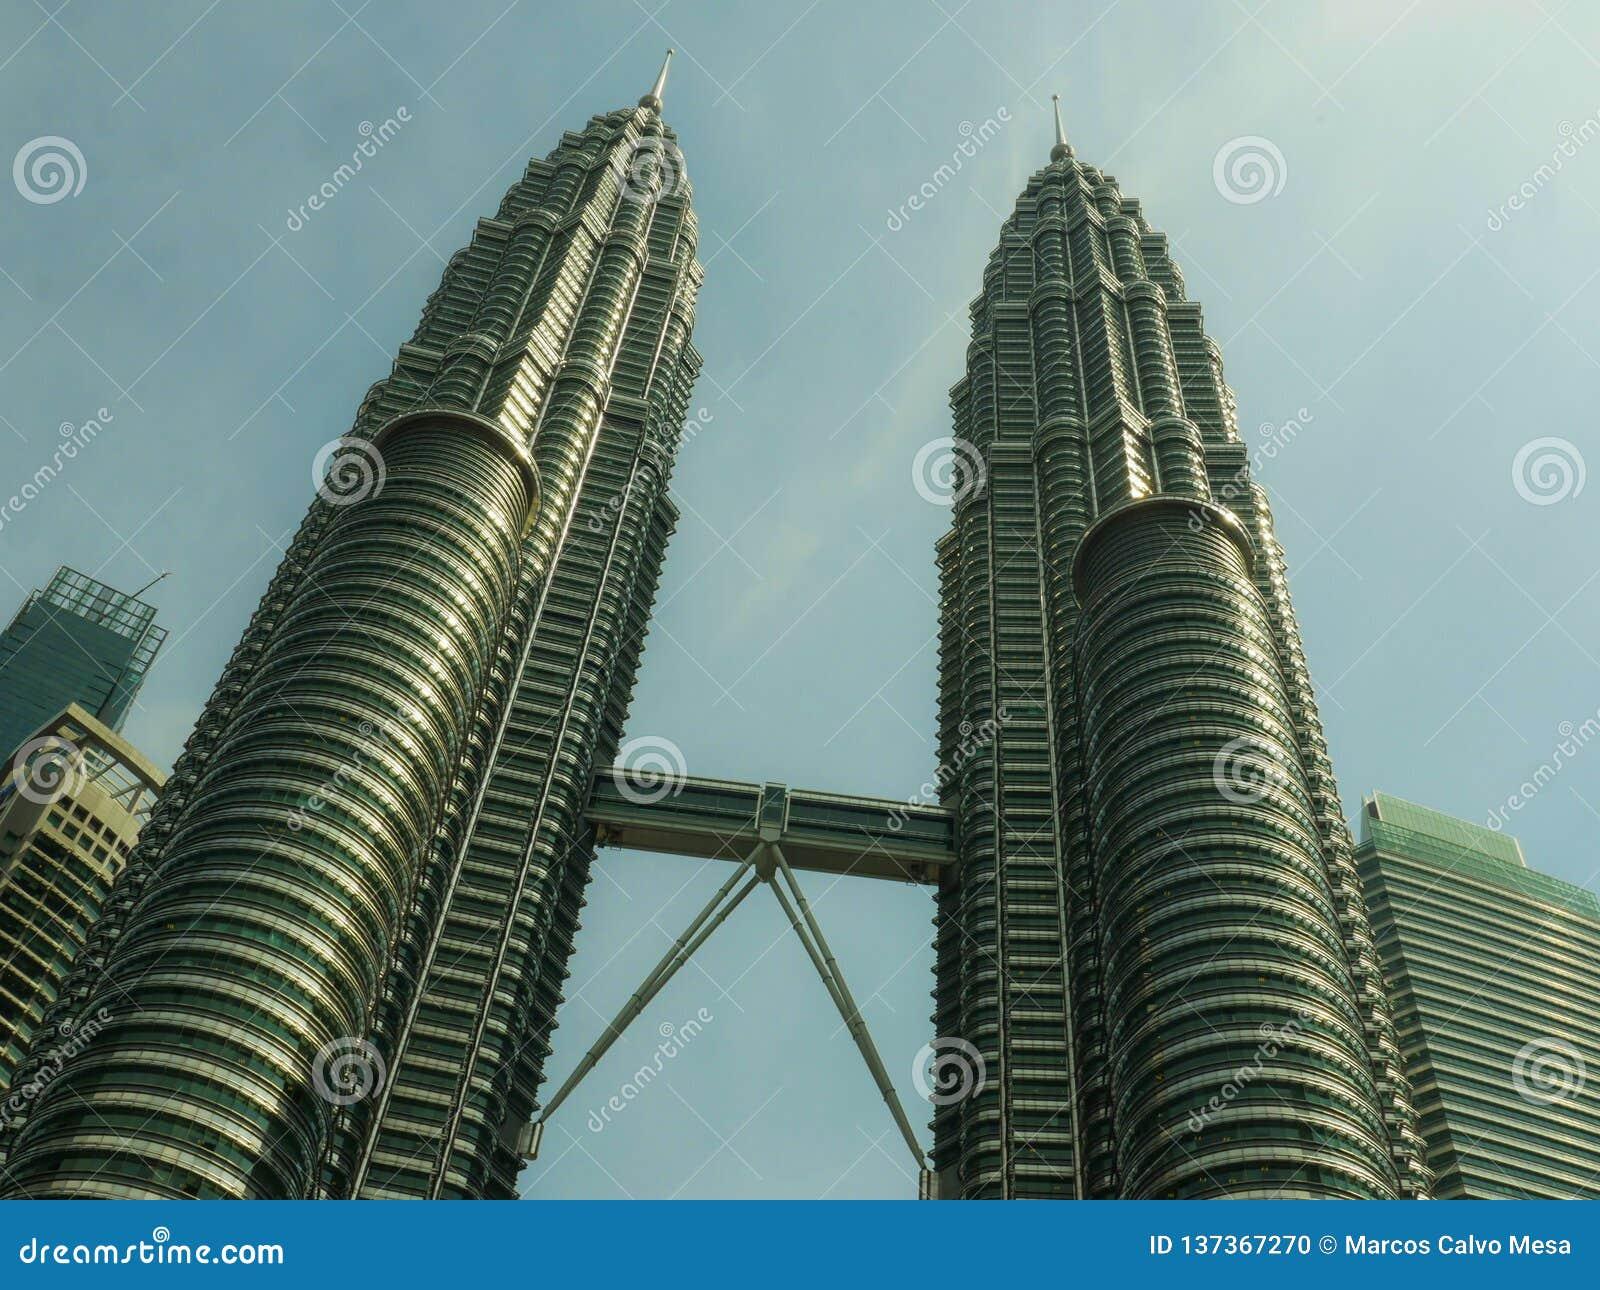 Kuala Lumpur Malaysia 2019 View Of The Impressive